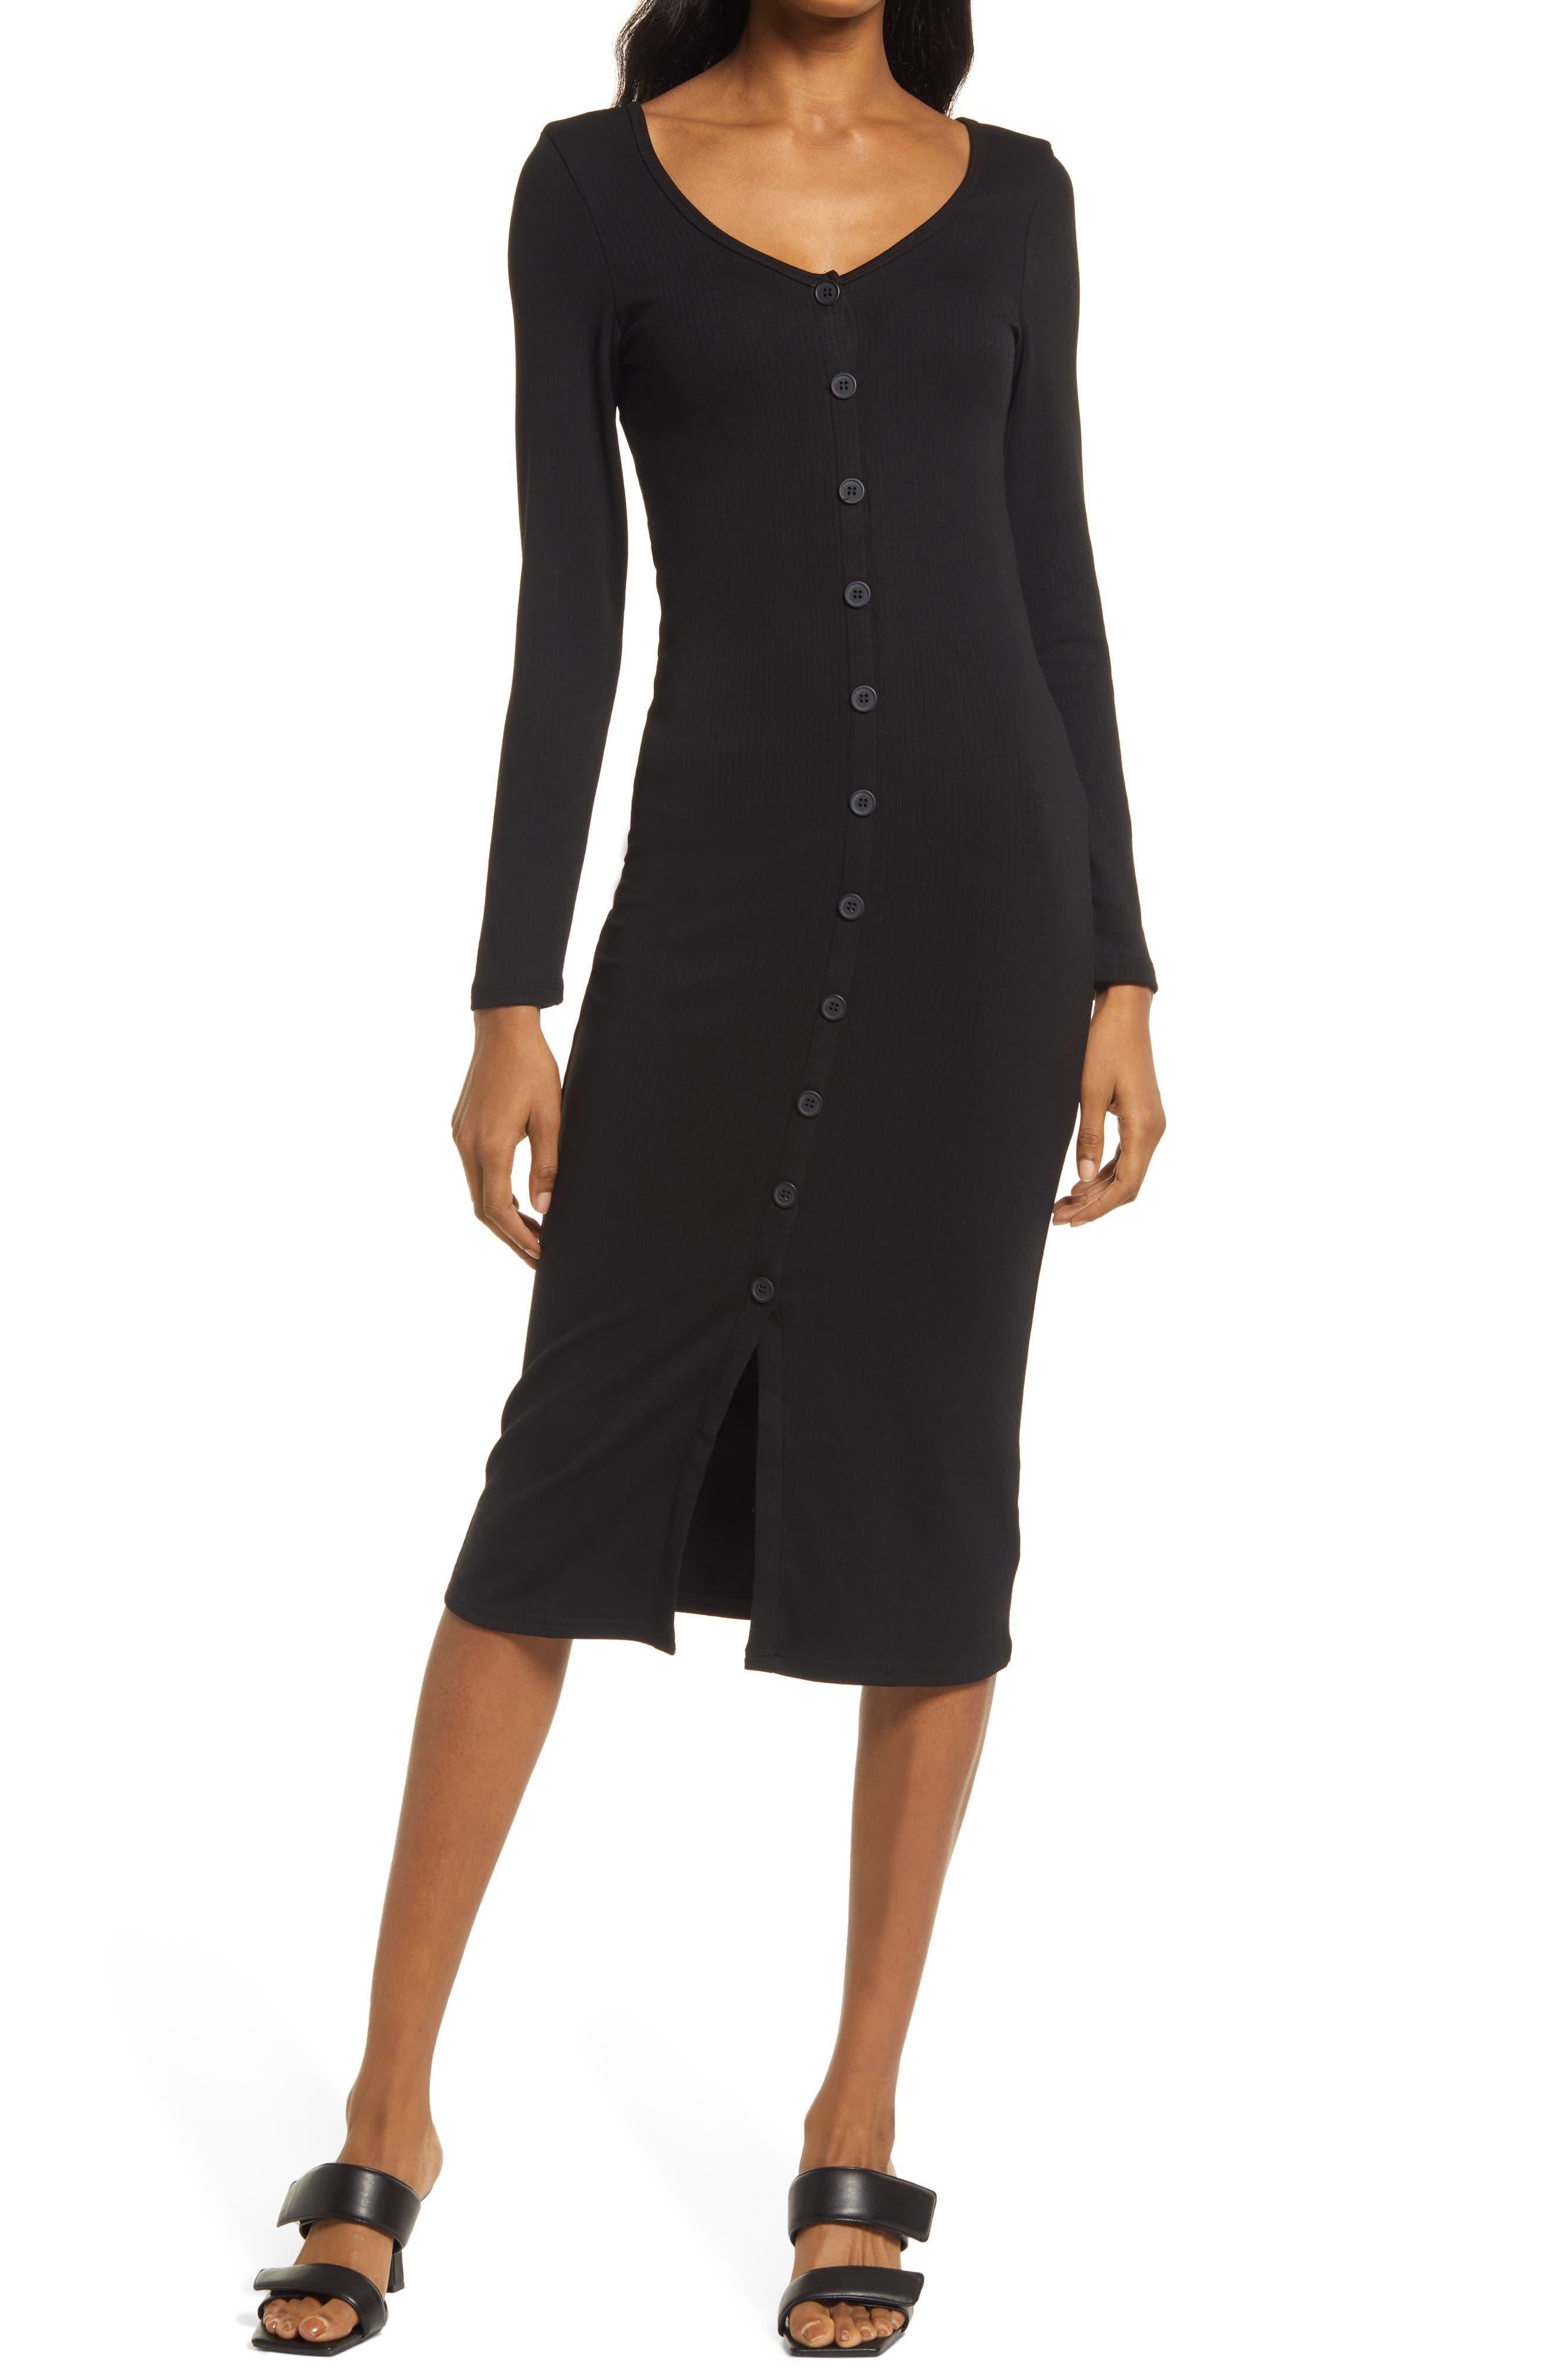 Vision Of Love Long Sleeve Midi Dress